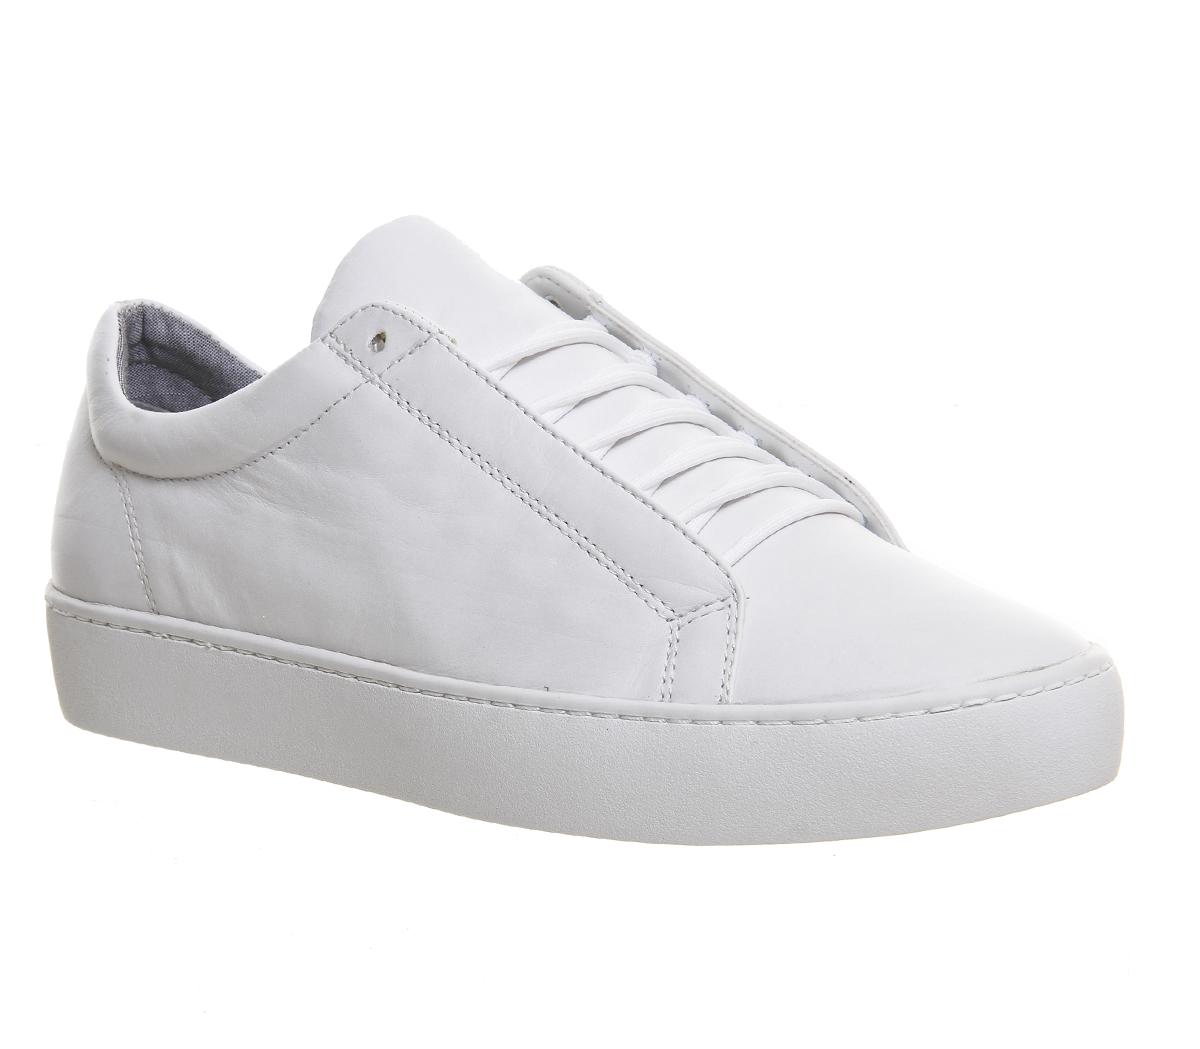 86b57d137c Sentinel Womens Vagabond Zoe Lace Sneaker WHITE LEATHER Flats